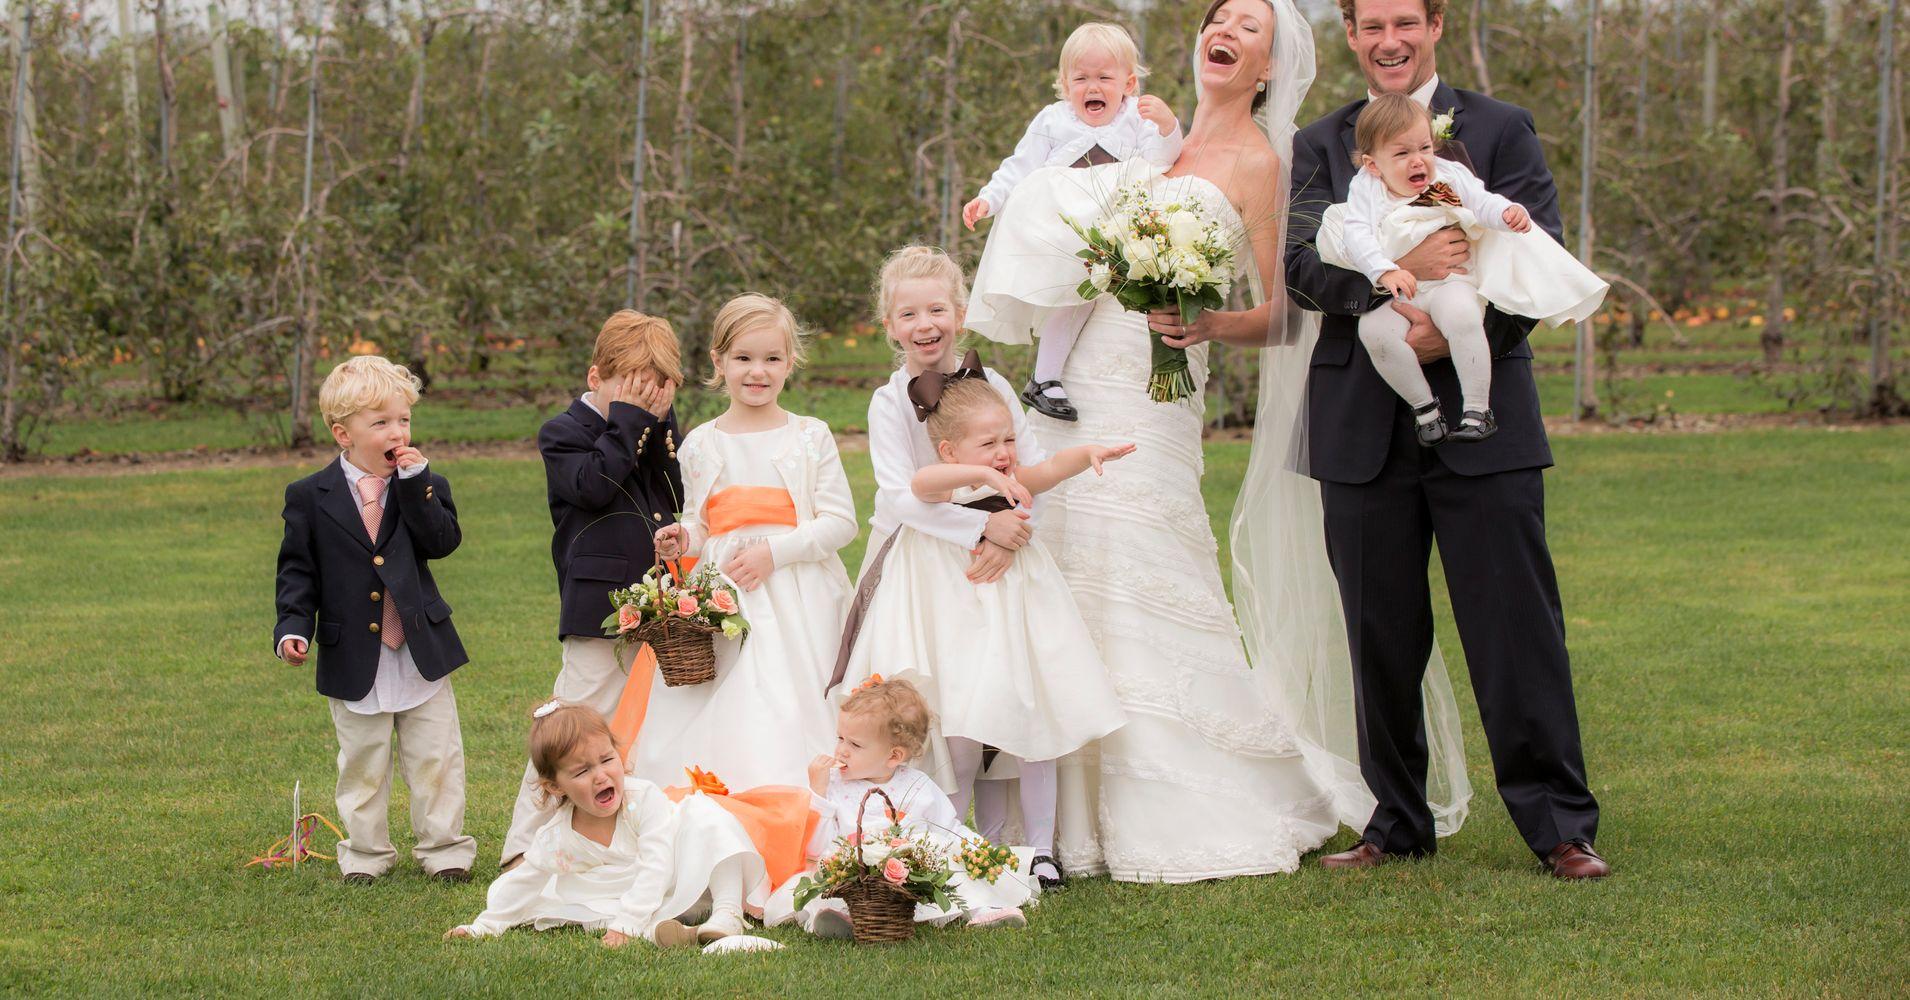 17 Hilarious But Unfortunate Wedding Fails Captured On Camera